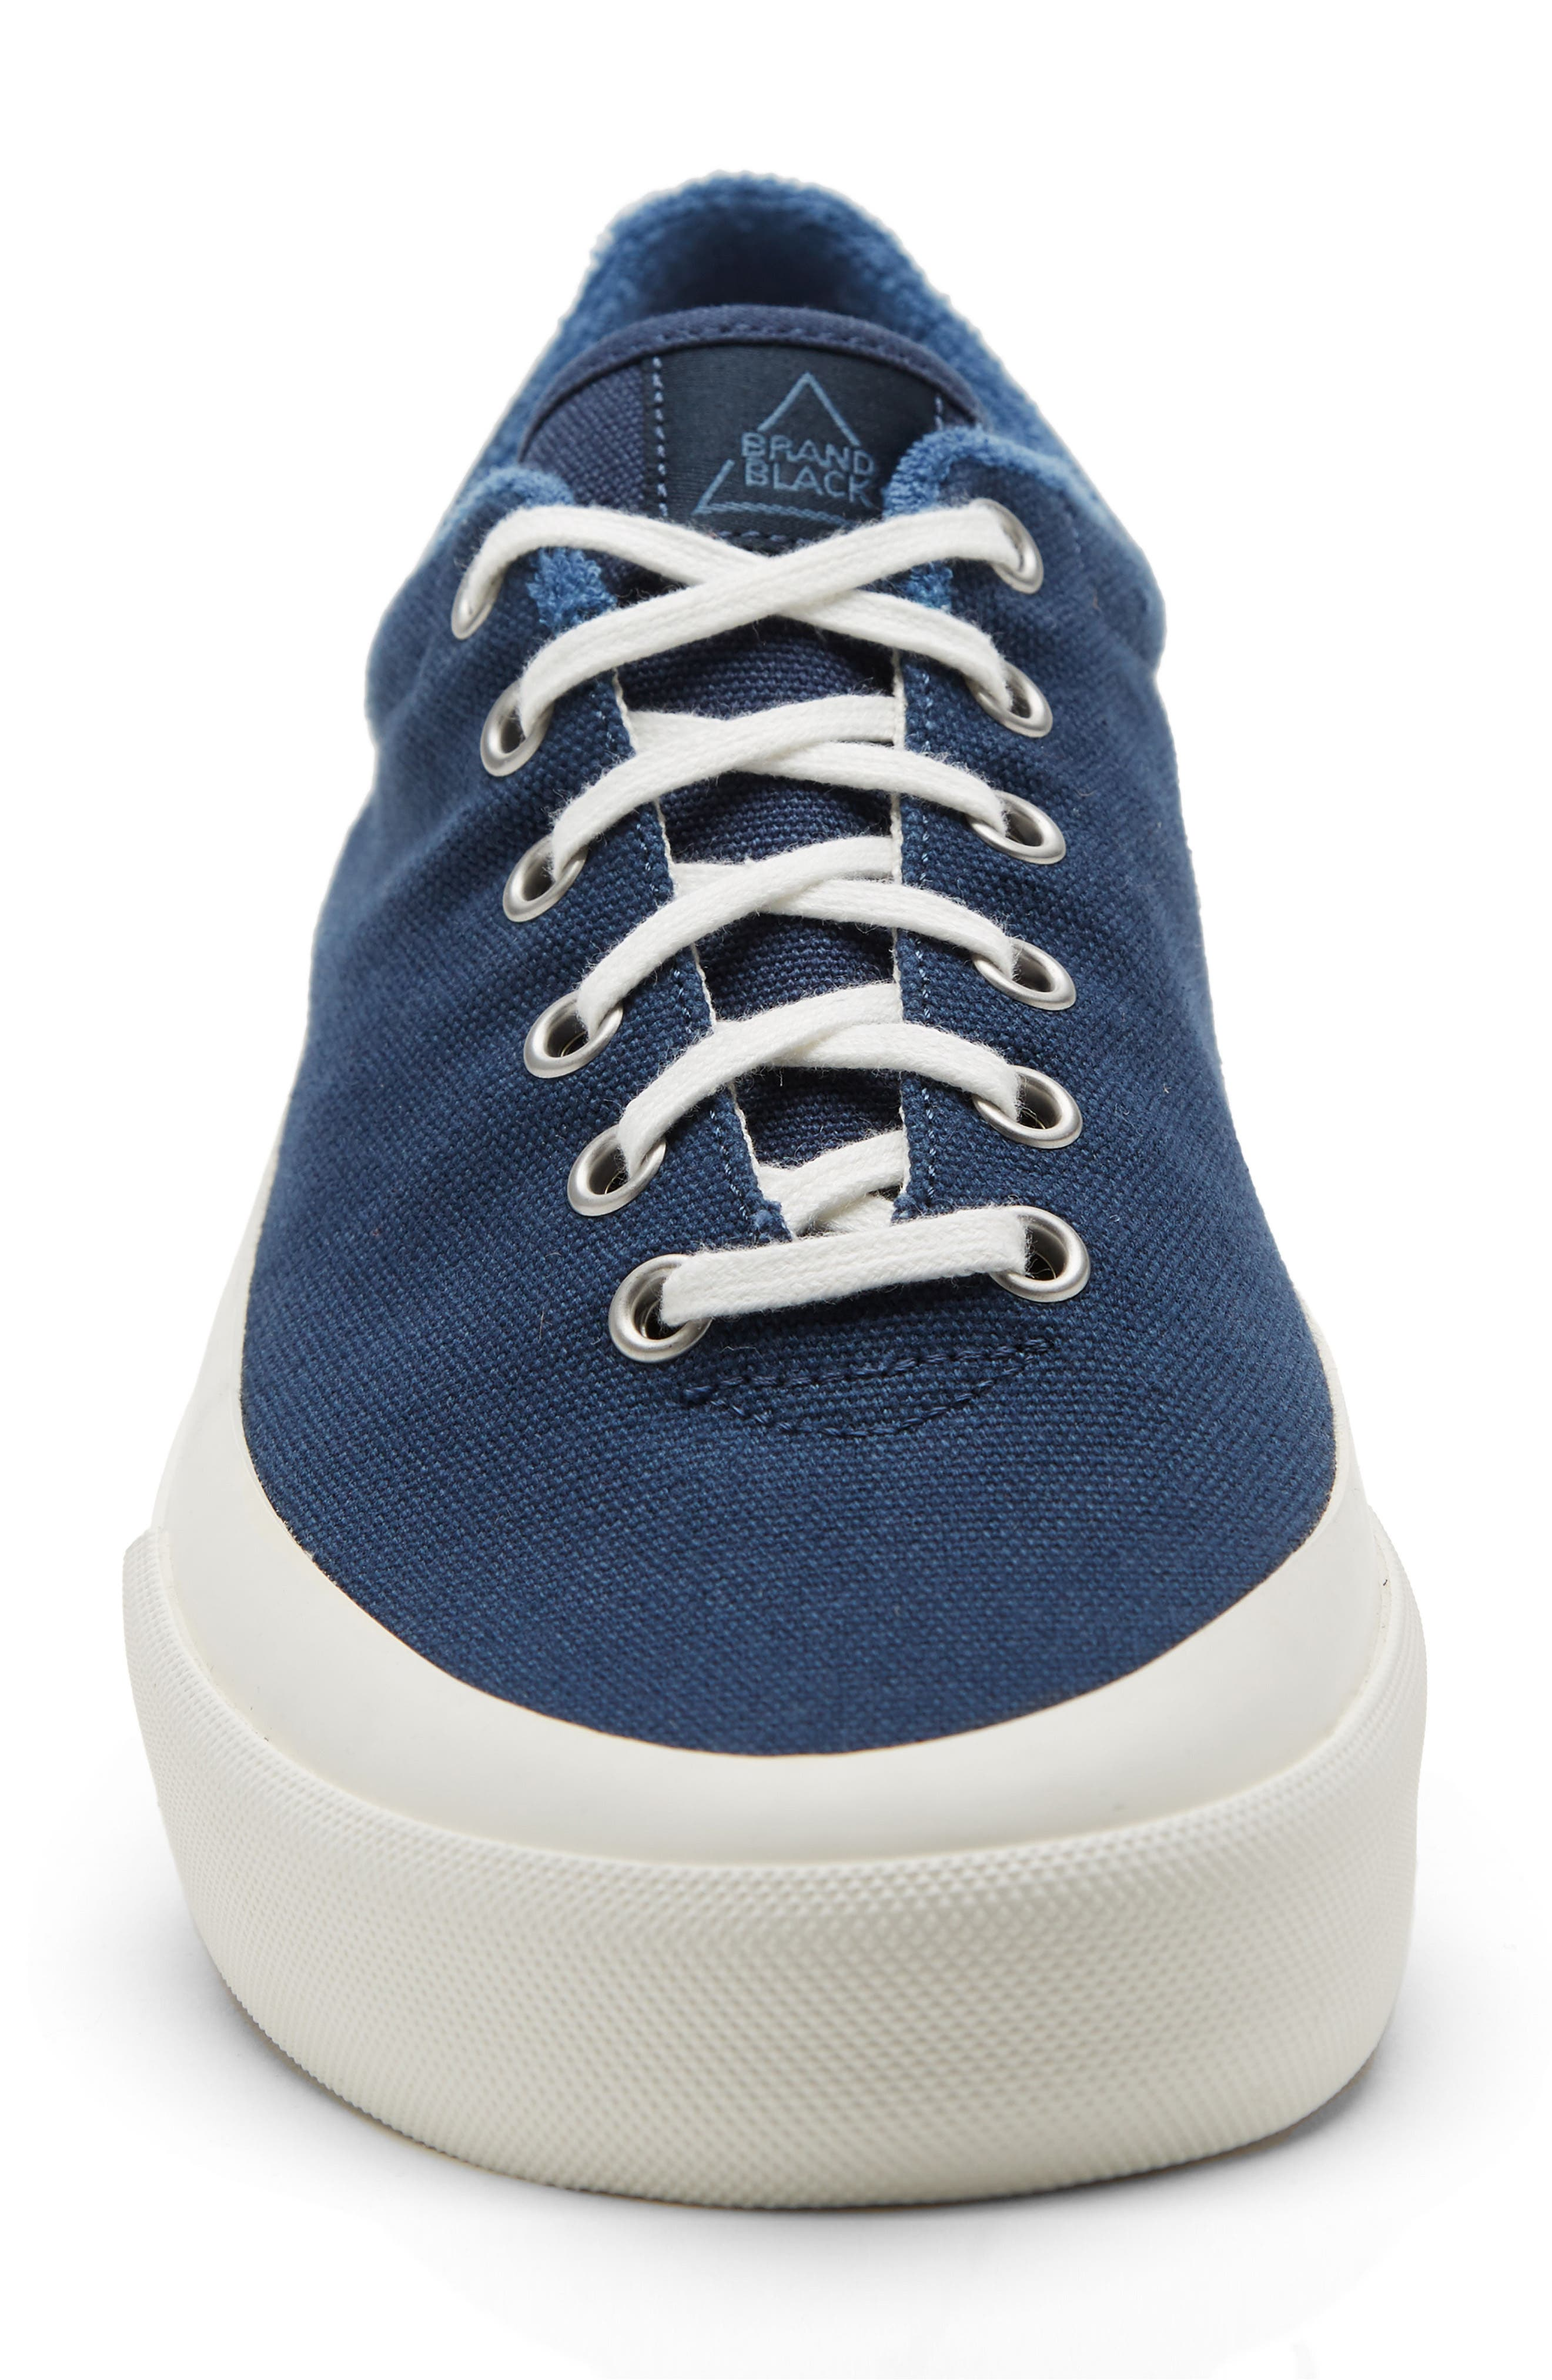 Vesta Low Top Sneaker,                             Alternate thumbnail 4, color,                             Navy